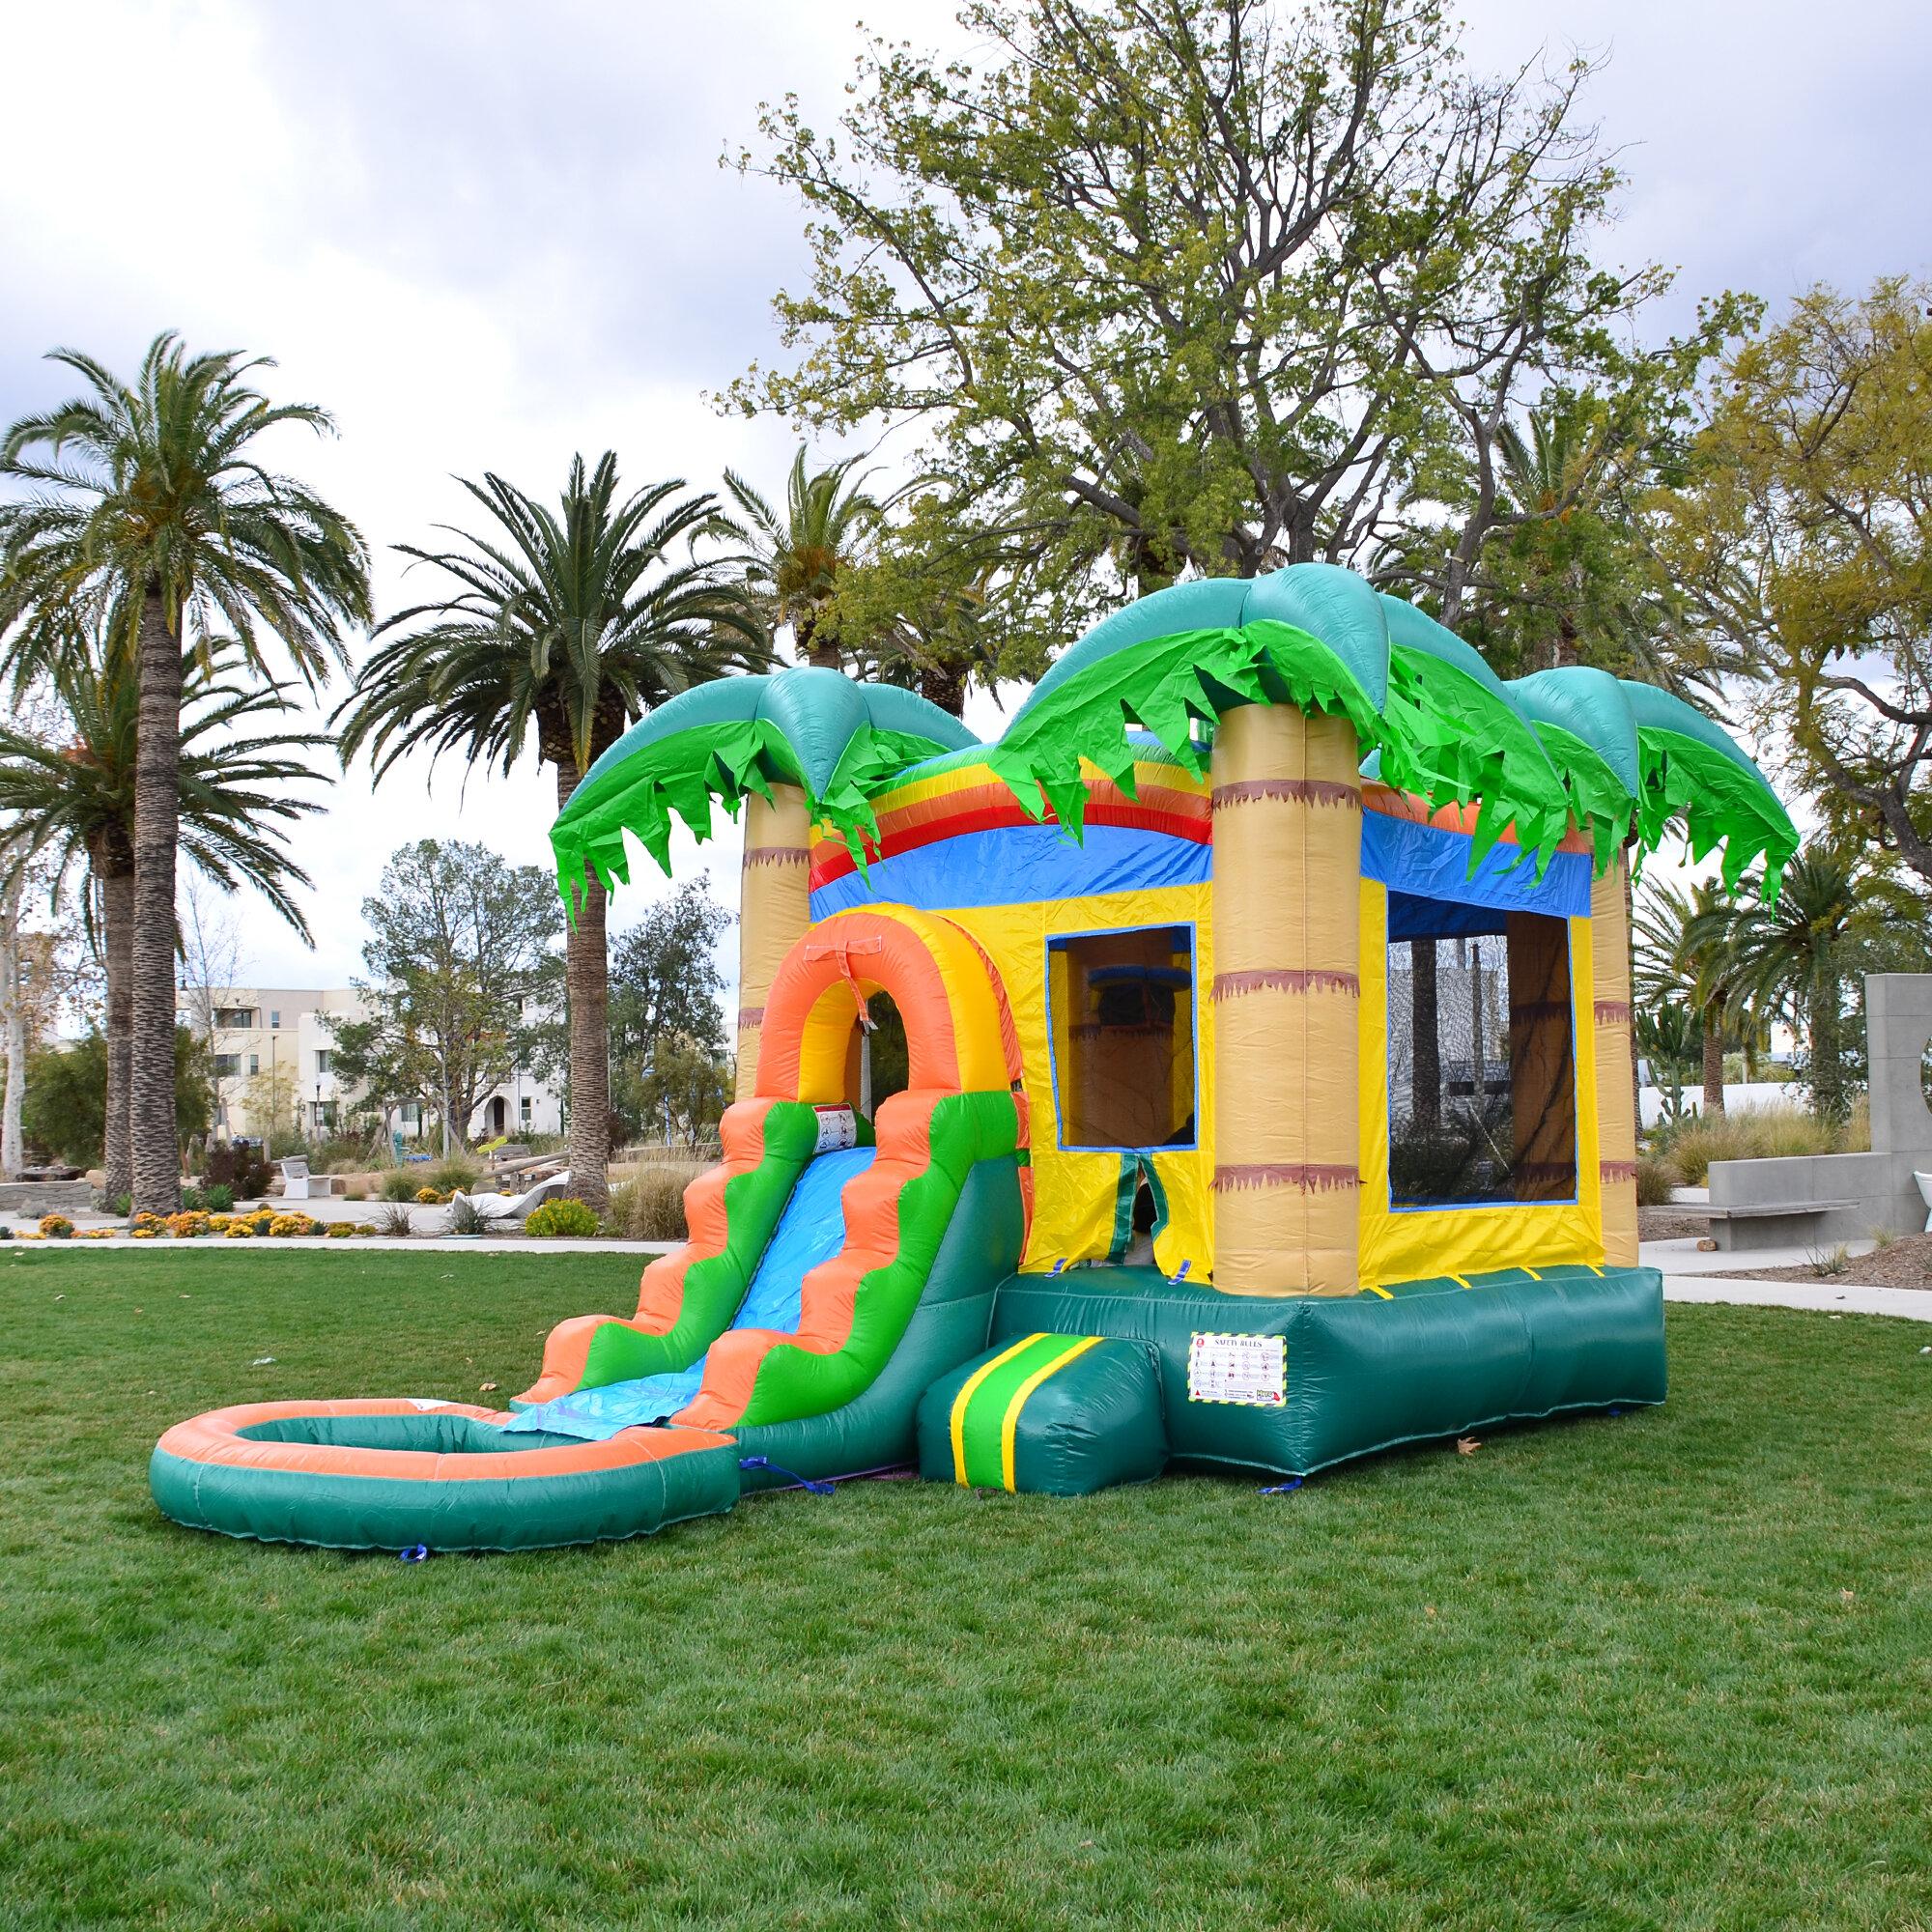 Herokiddo 12 X 24 Bounce House Water Slide And Air Blower Reviews